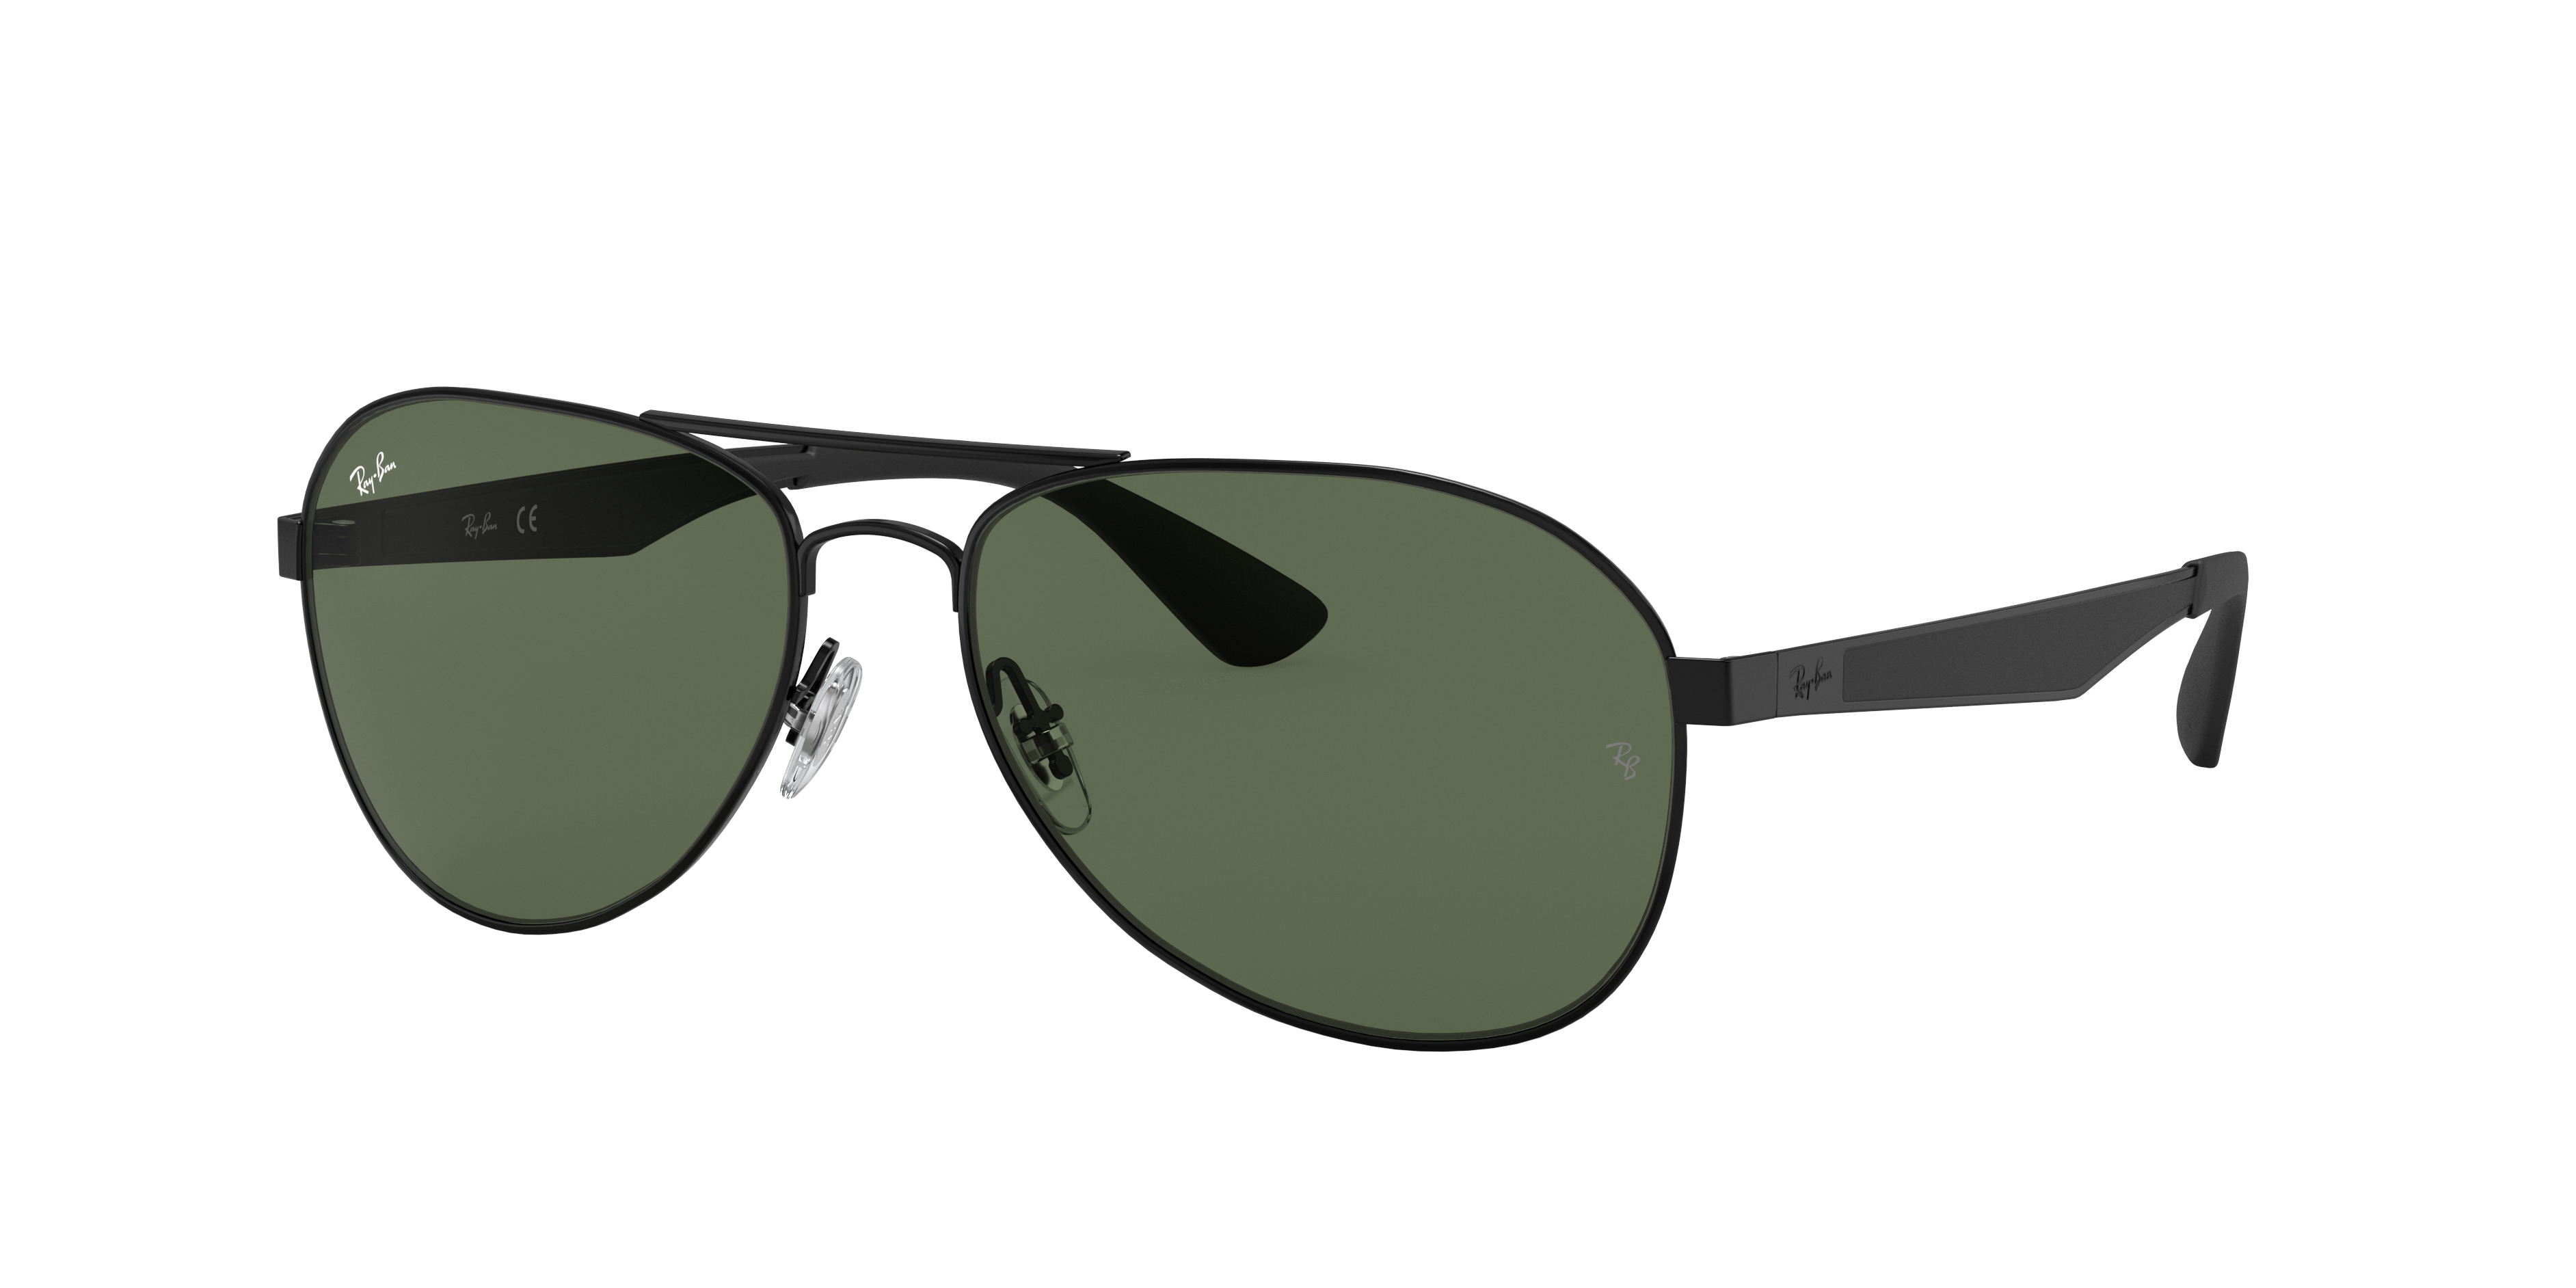 Ray-Ban Rb3549 Black, Green Lenses - RB3549